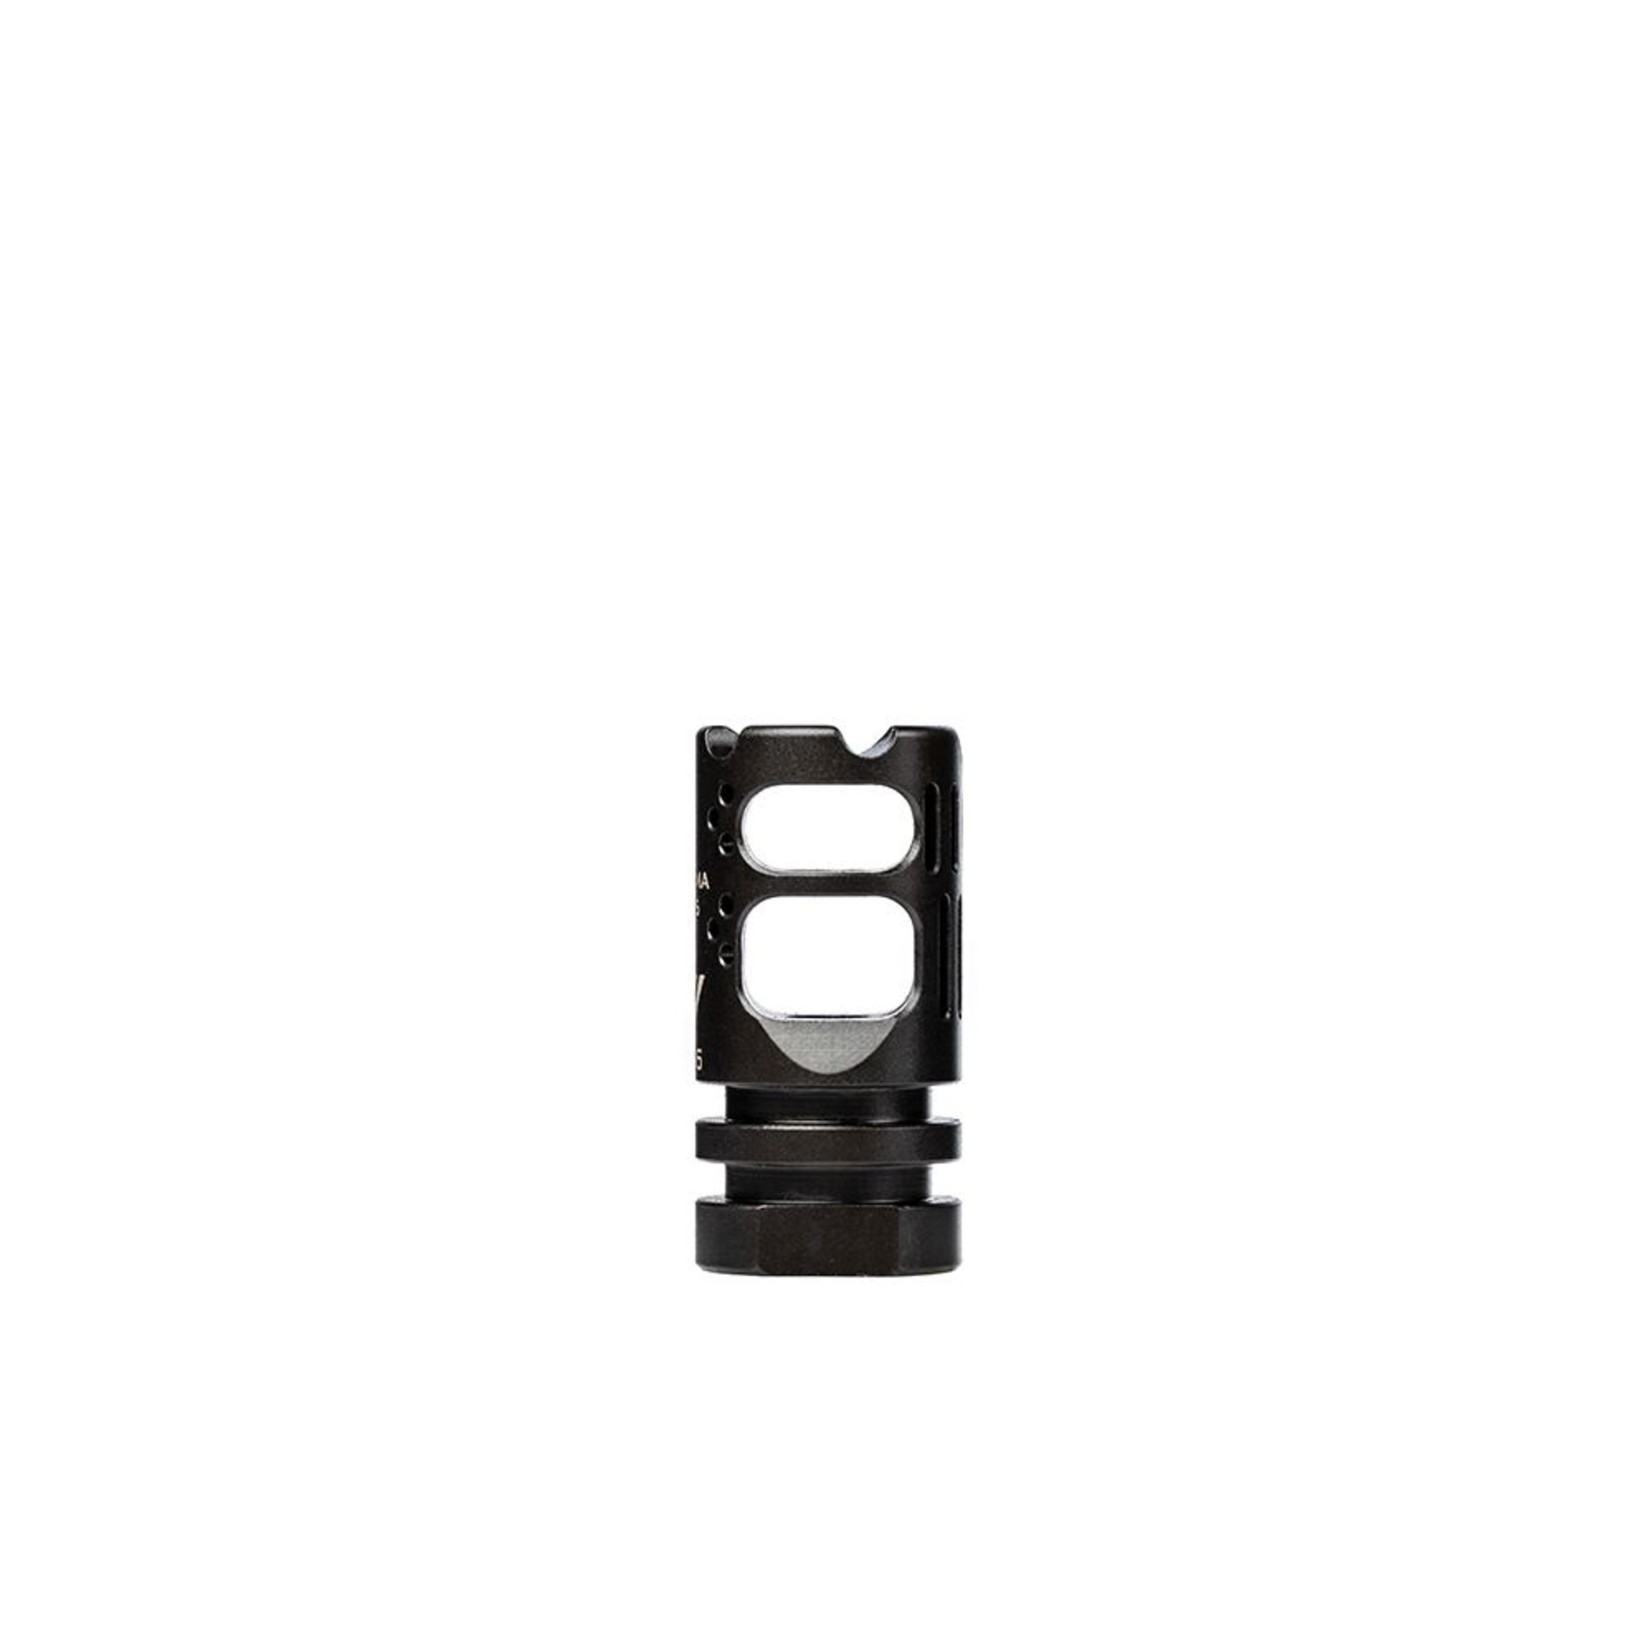 VG6 VG6 Gamma Muzzle Break, Black, Gamma 556